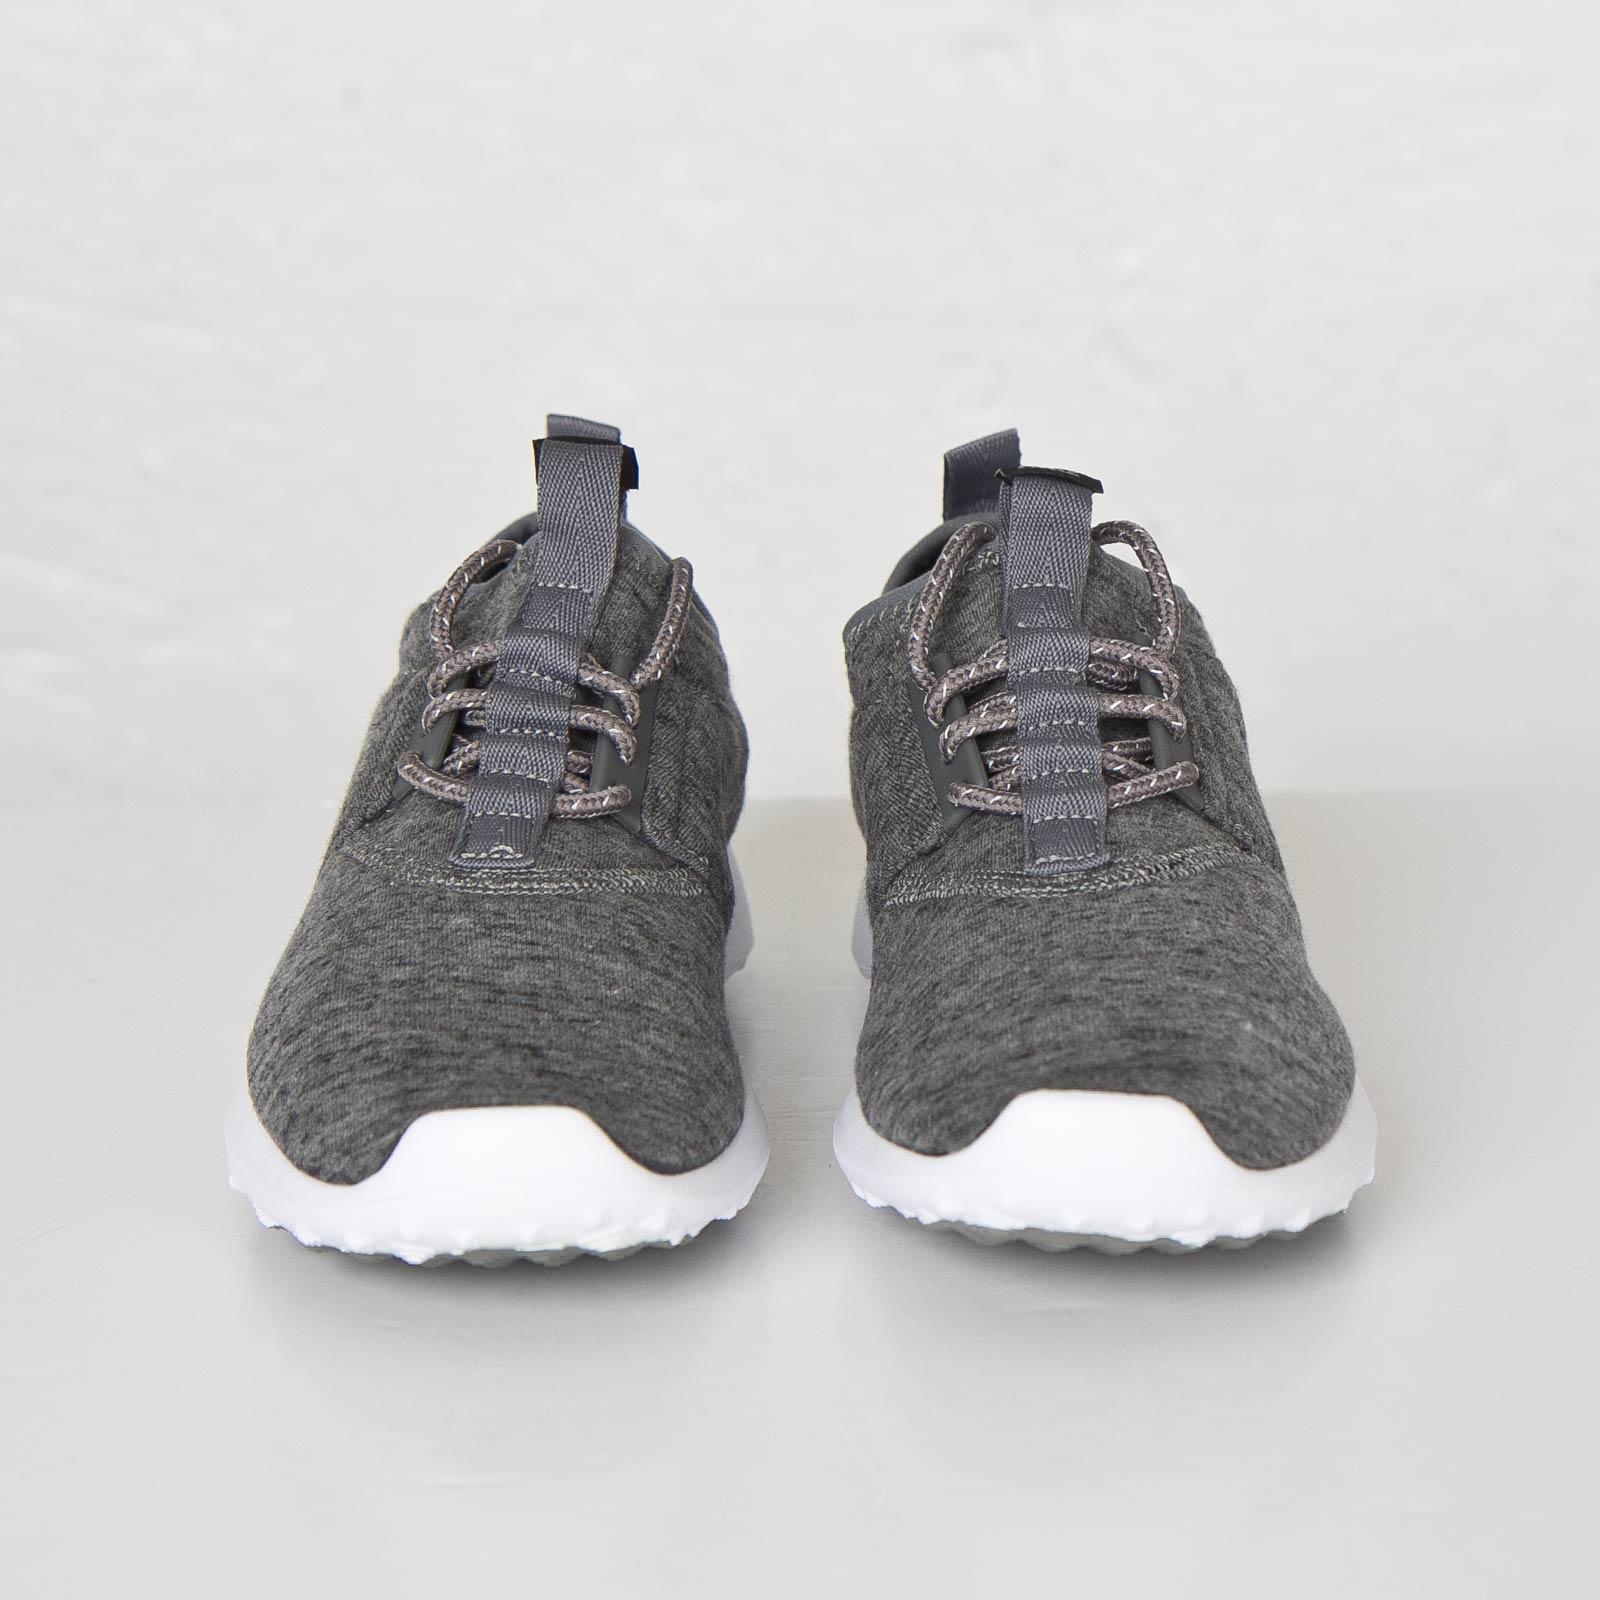 Nike Wmns Juvenate Fleece 749551 001 Sneakersnstuff